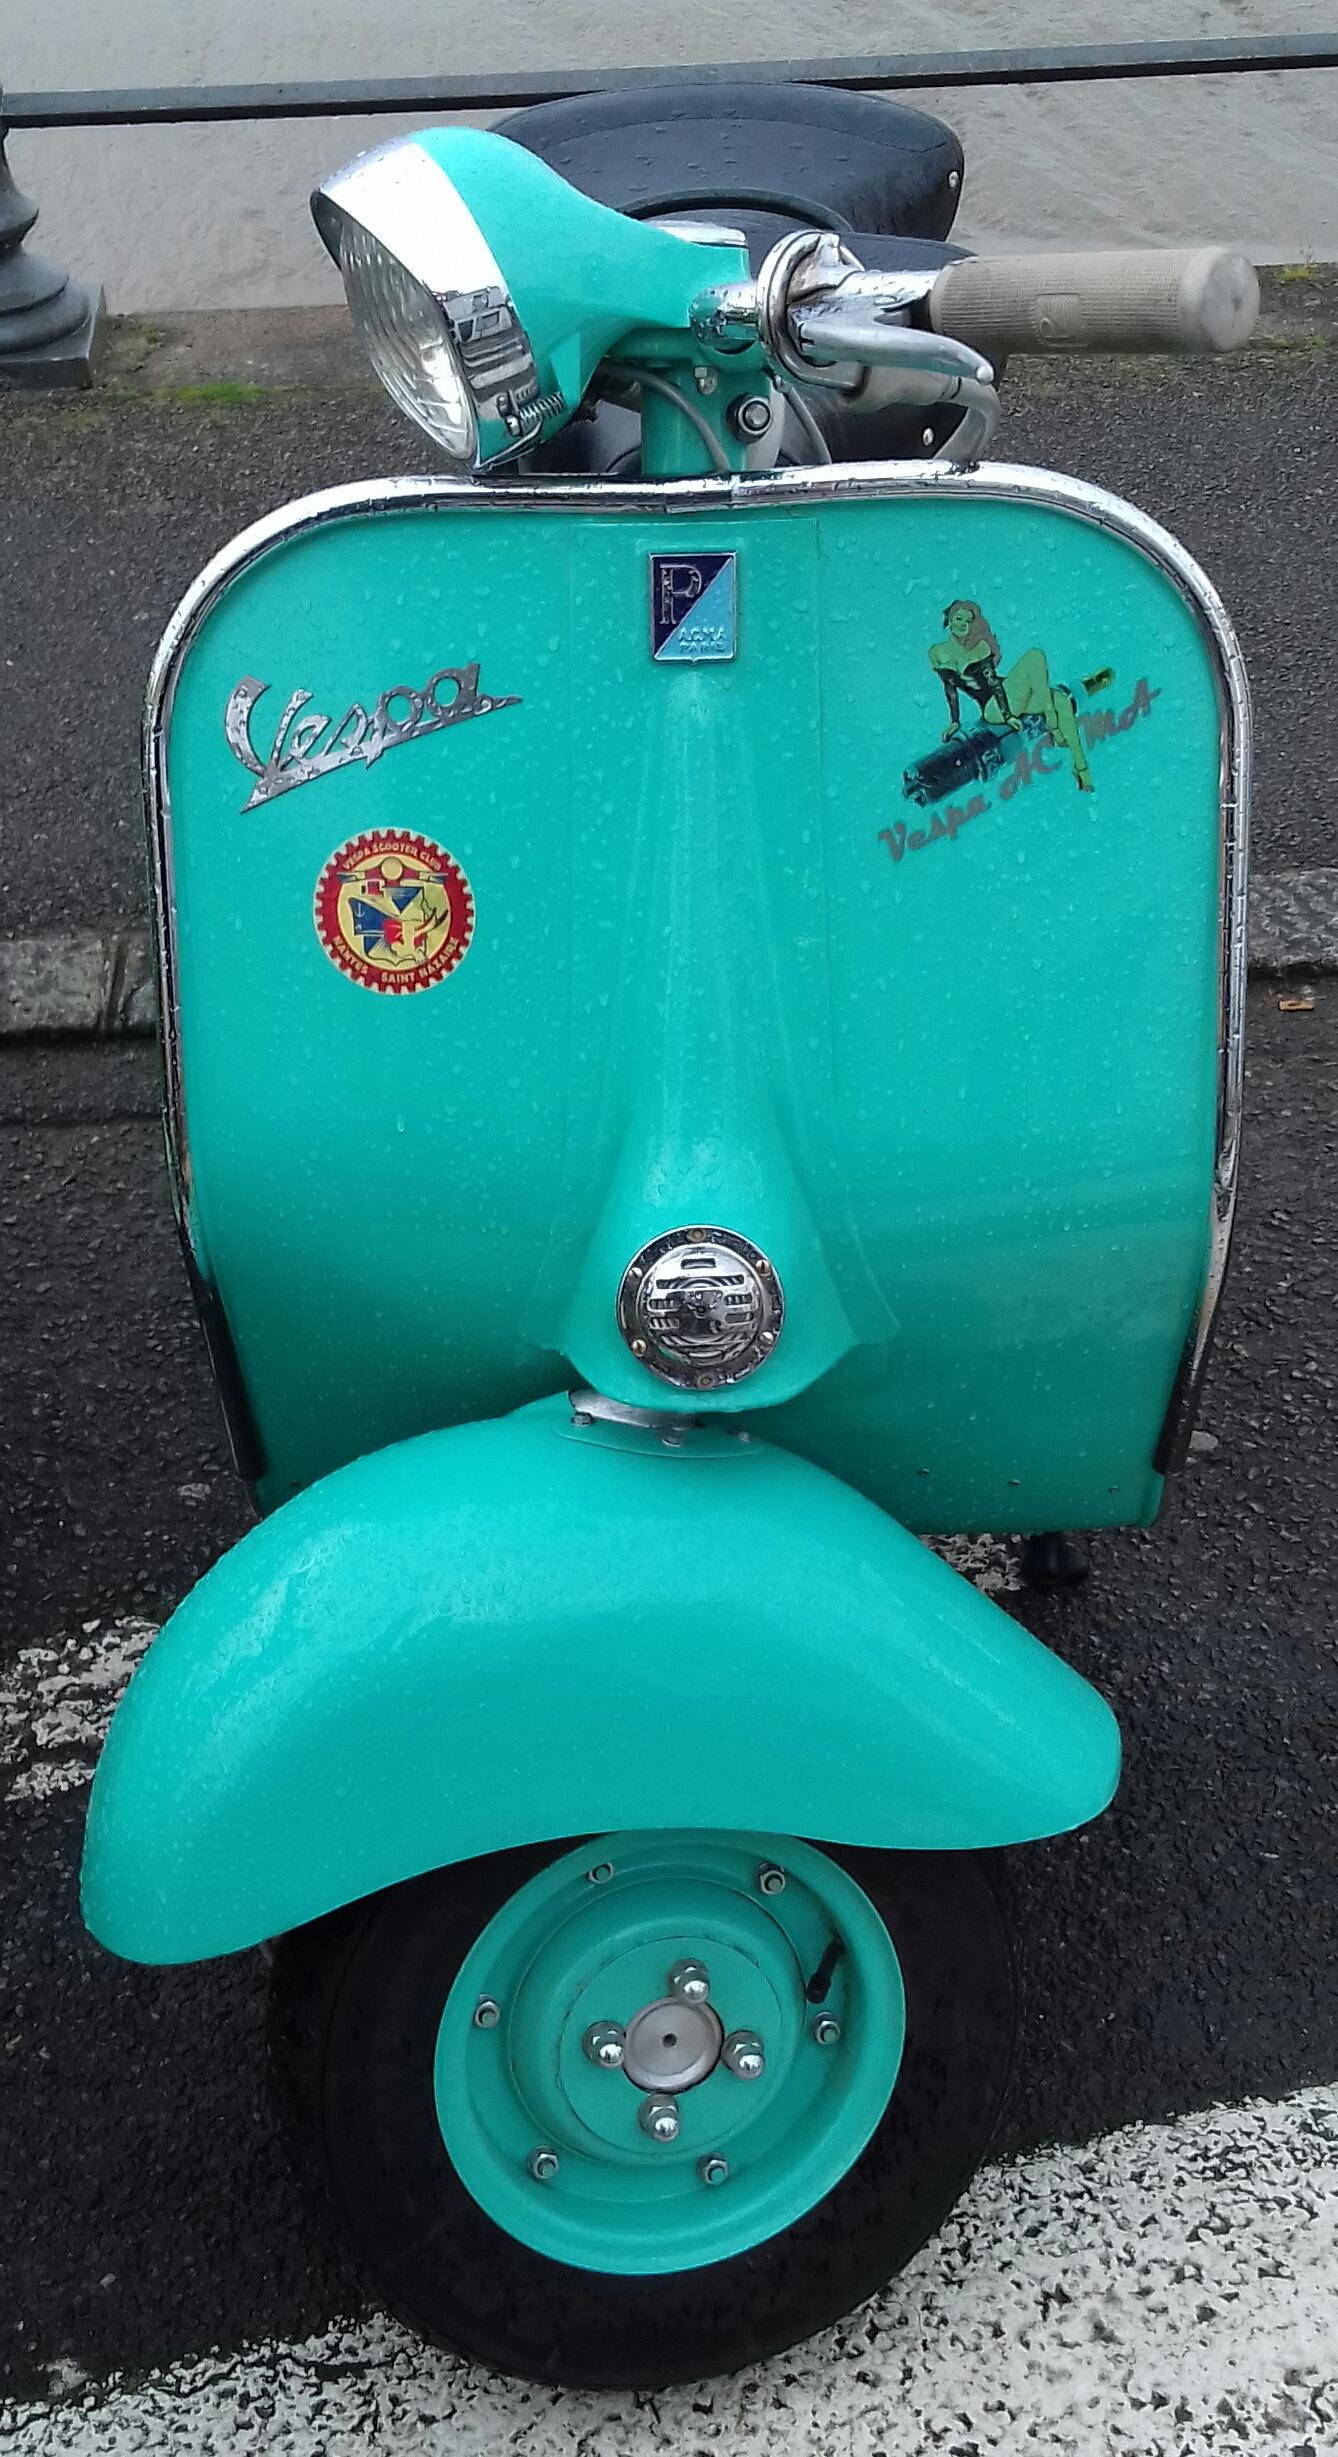 Vespa Scooter Club Nantes St Nazaire